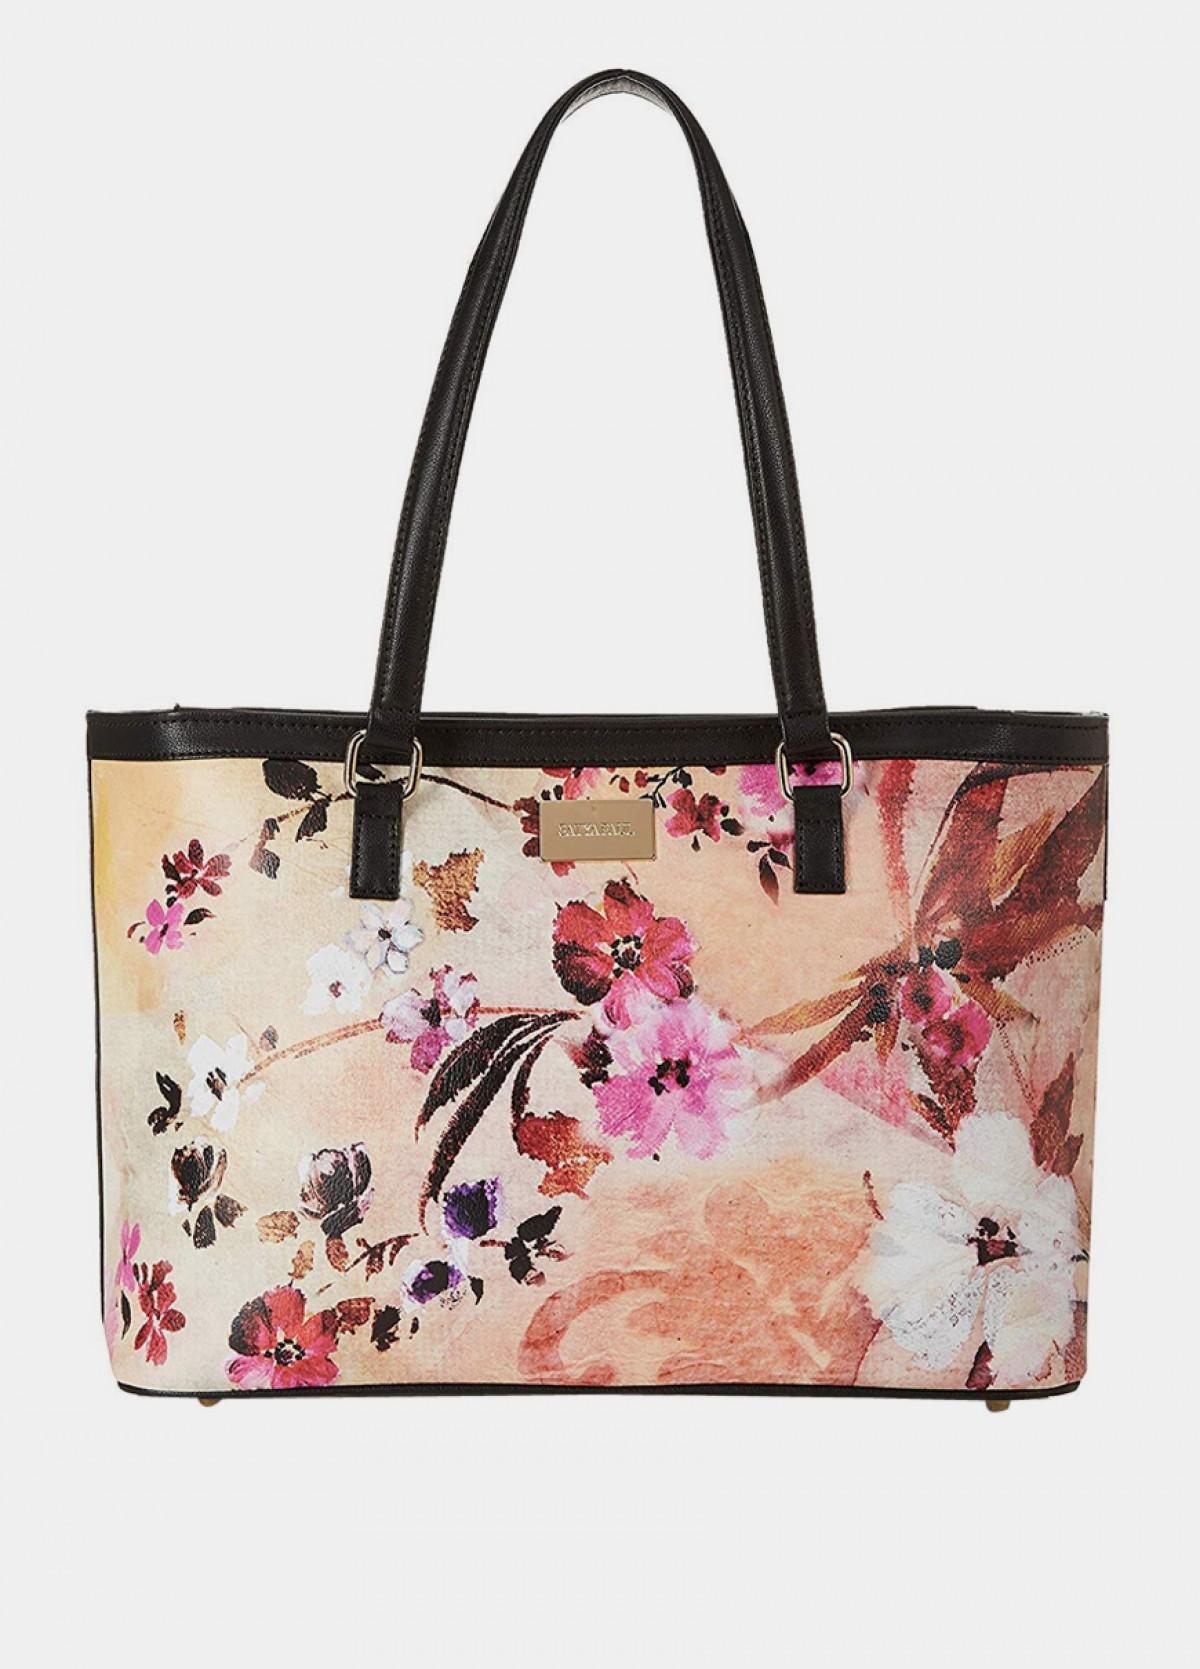 The Printed Tote Handbag